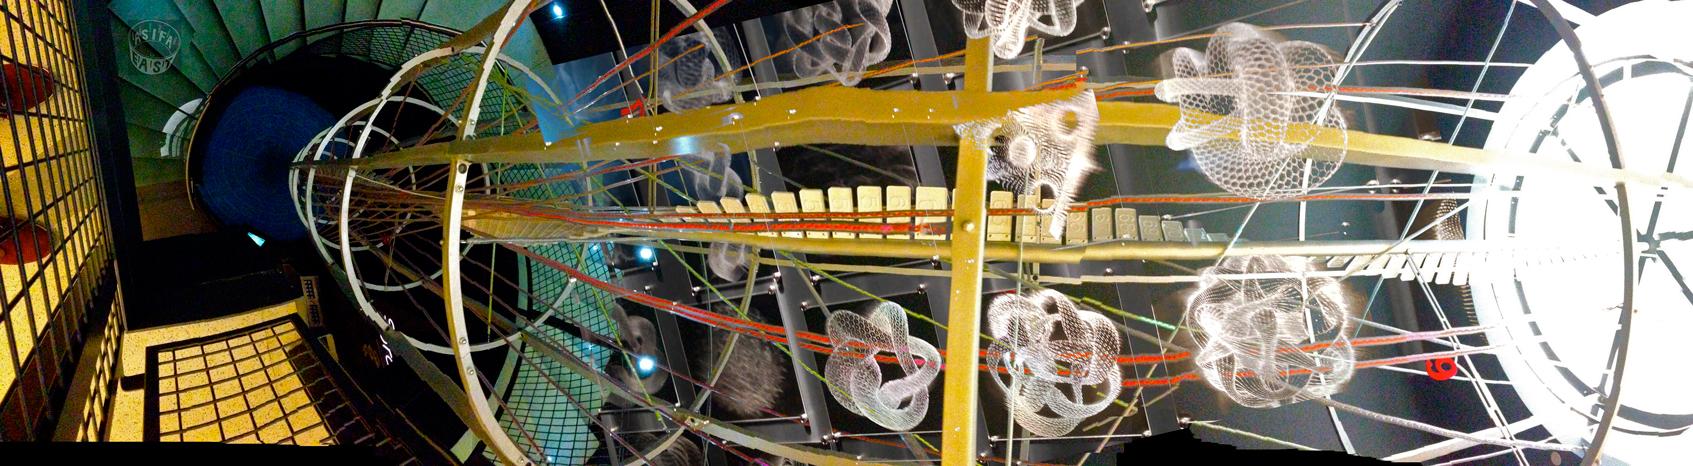 Laser-Etched Moebius Geometry & Multiplication-TARDIS